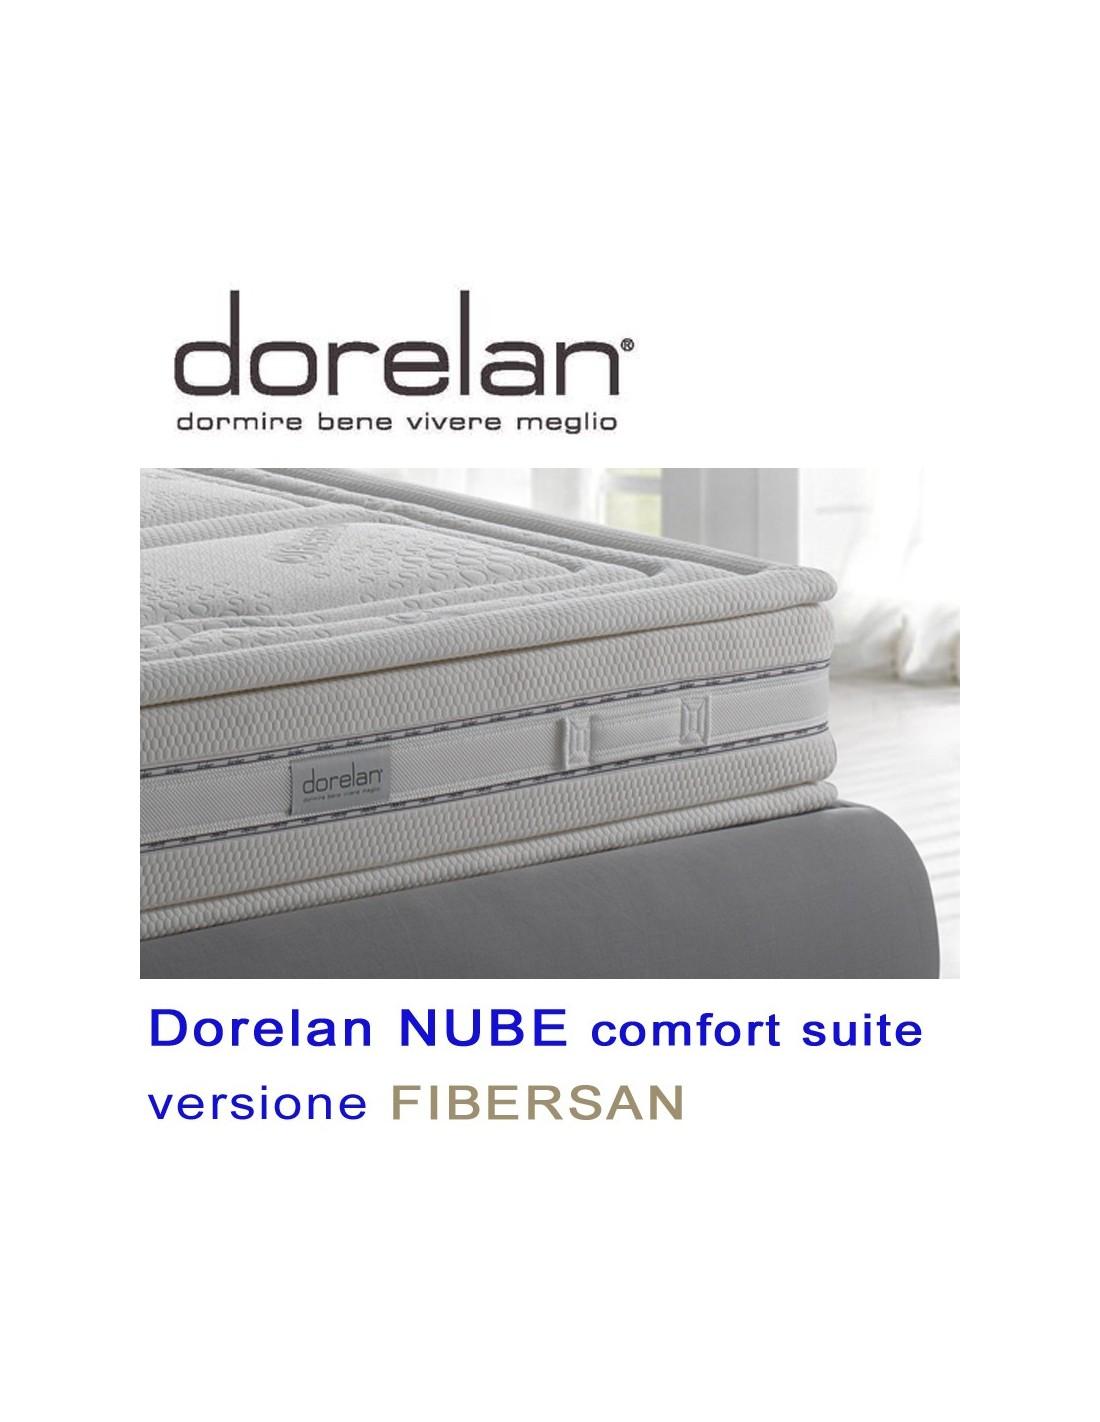 Materasso Dorelan Nube CS Myform Memory Clima tra i materassi Dorelan